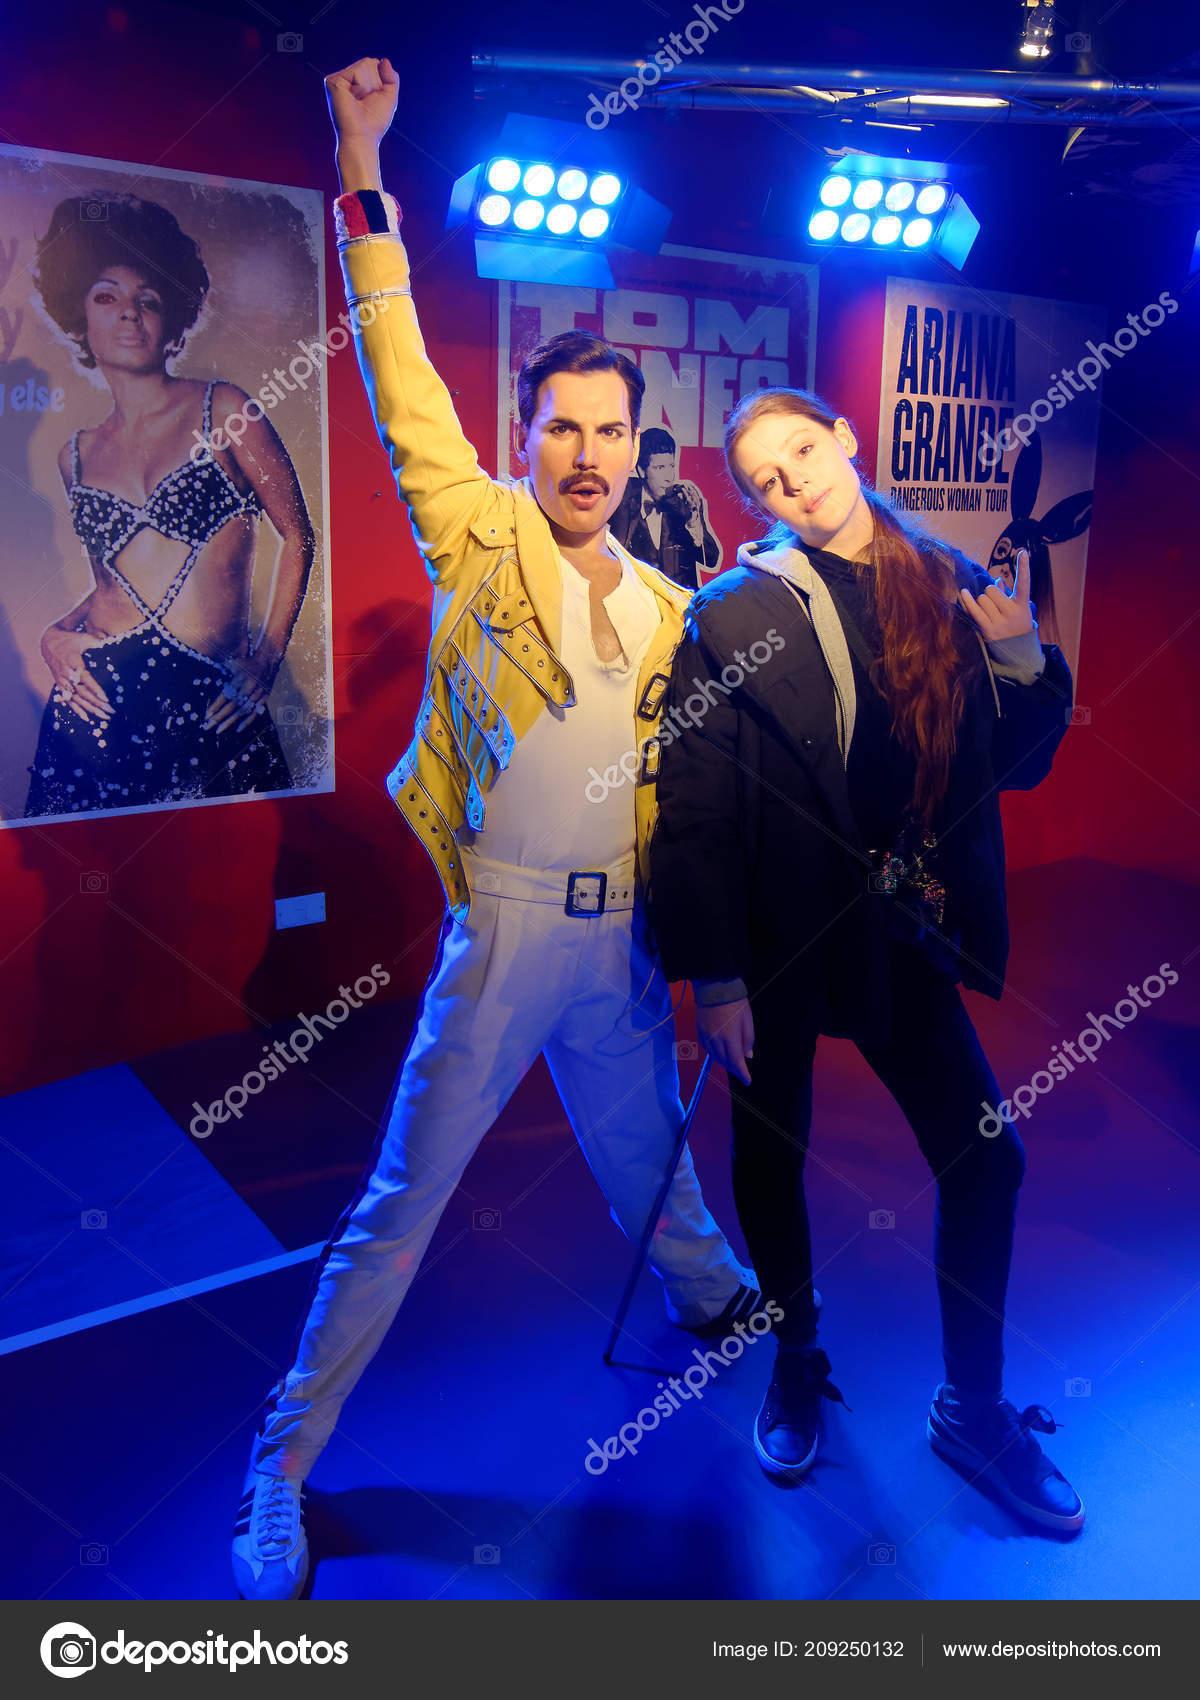 165e7175ca9 Αθήνα Ιανουαρίου Madame Tussauds Ηνωμένο Βασίλειο 2018 Freddie Mercury  Ήταν– Εκδοτικές Φωτογραφίες Αρχείου